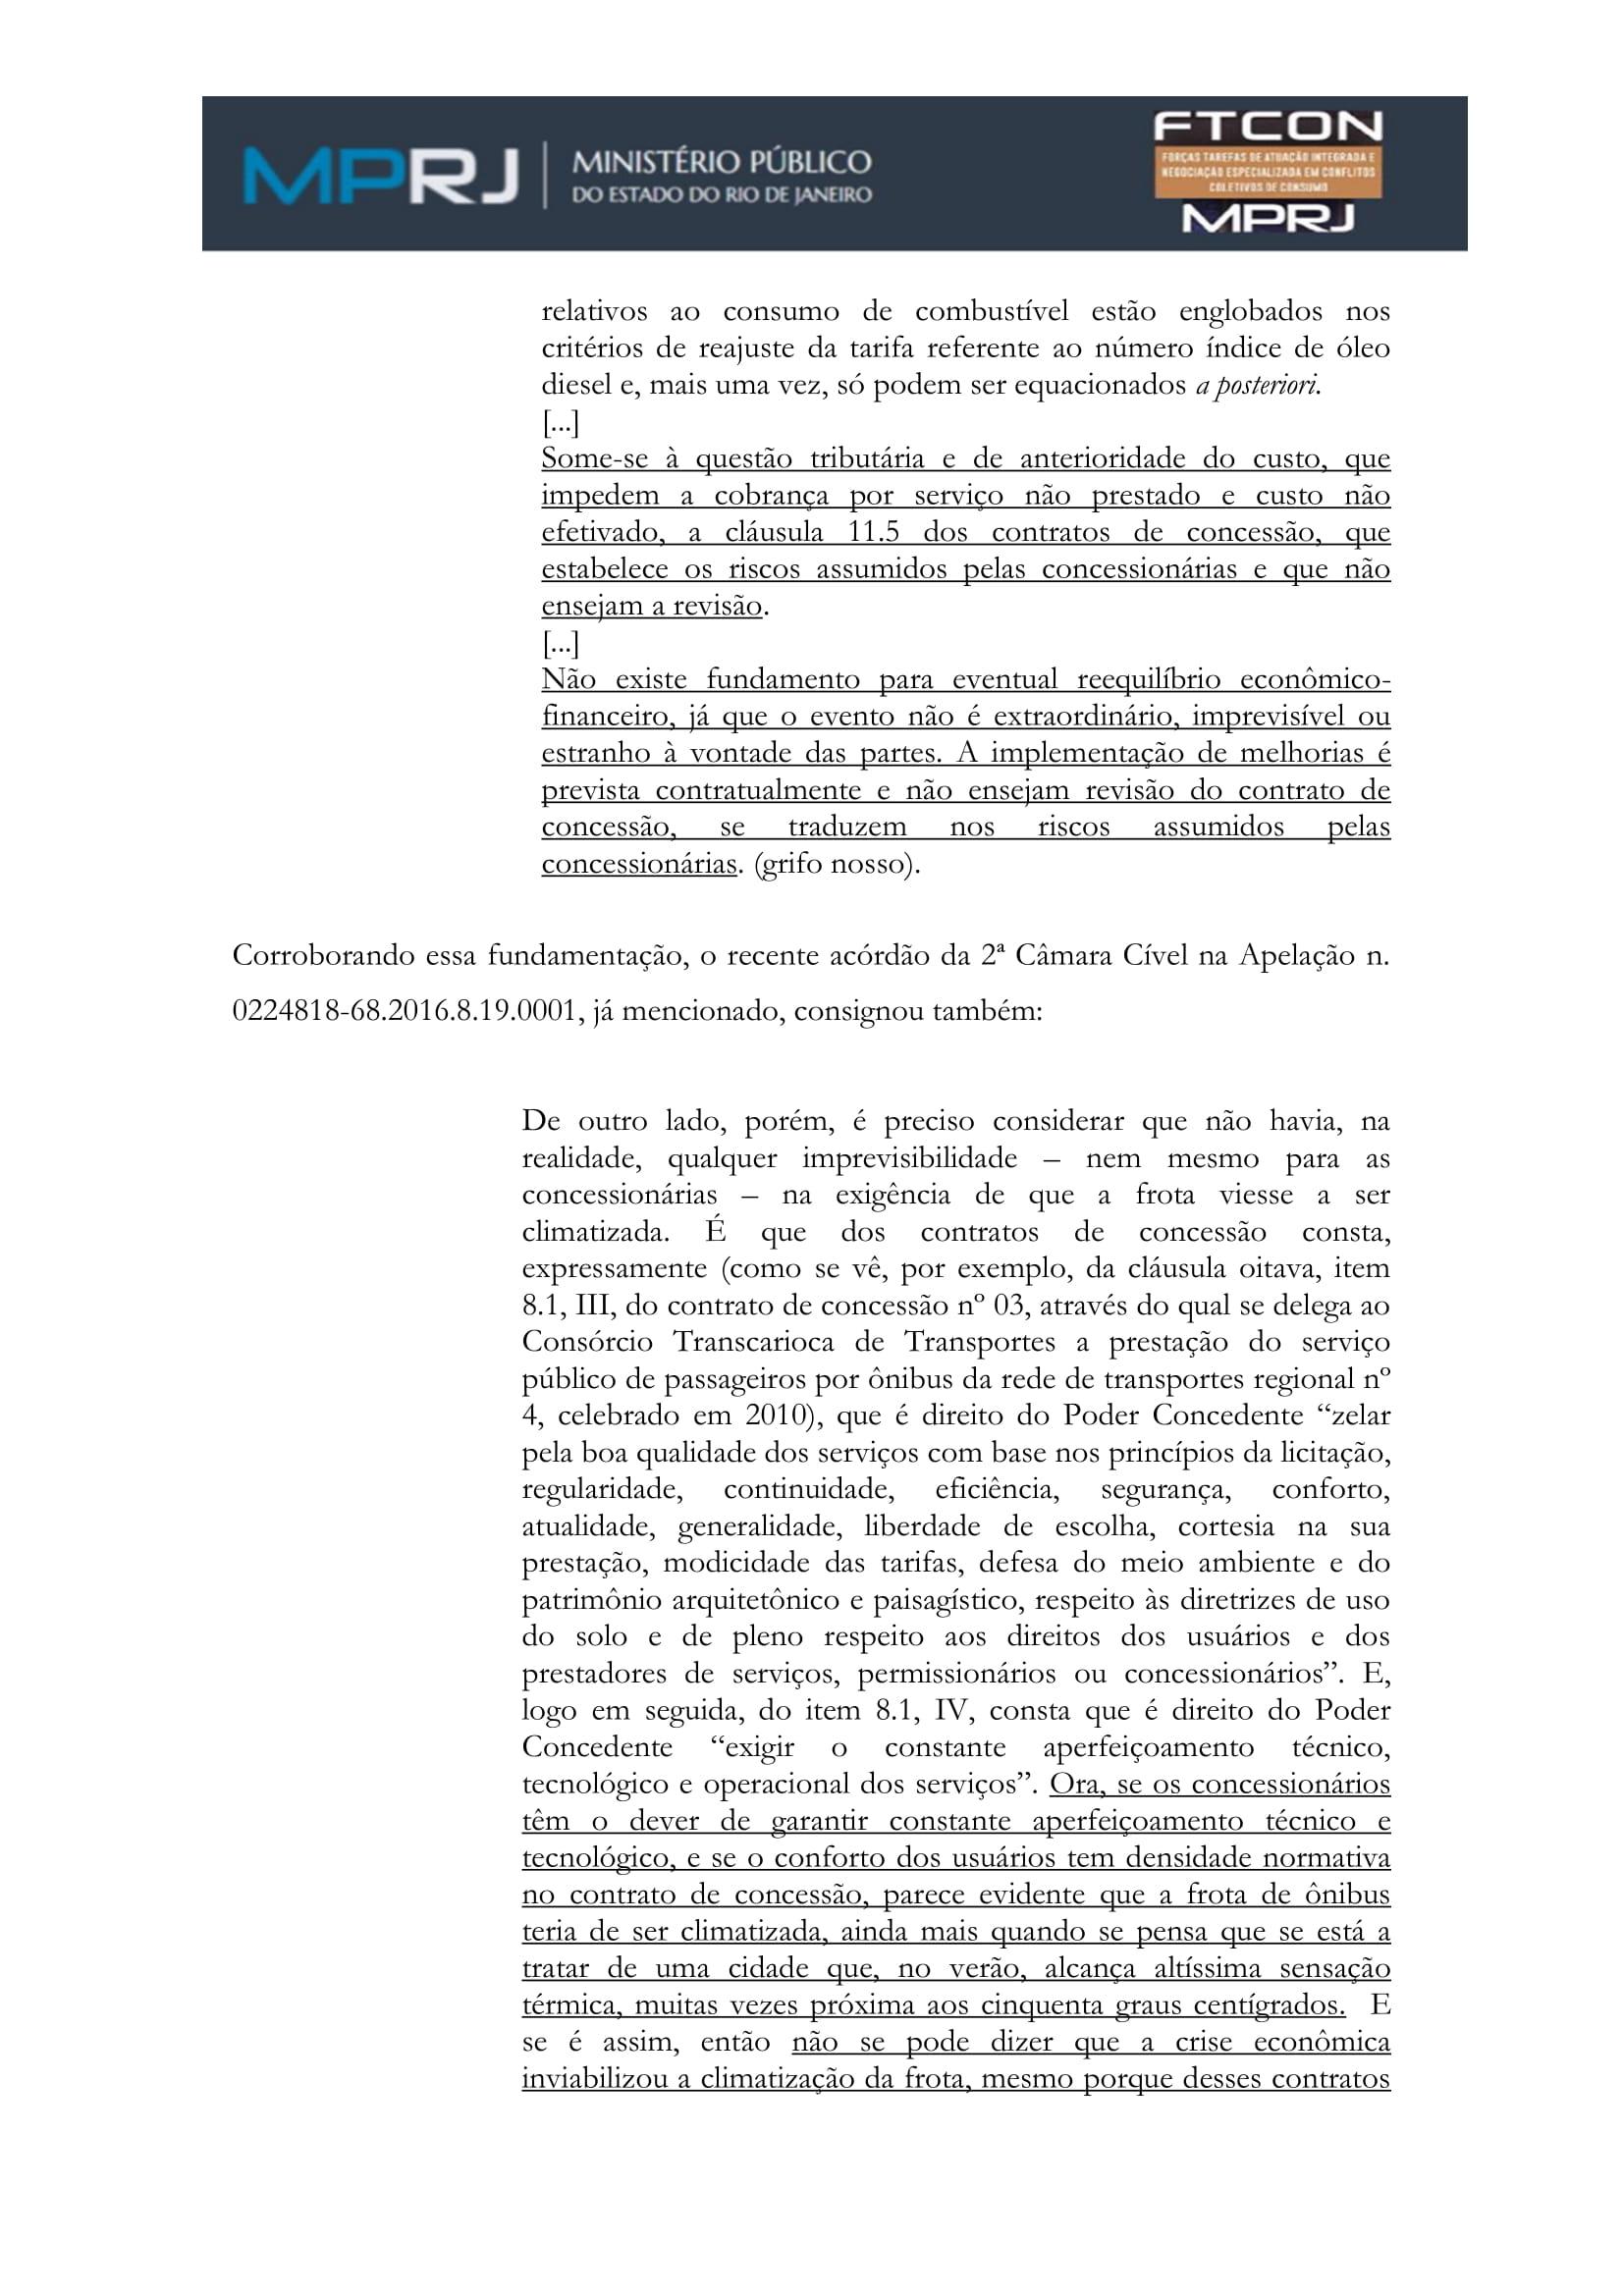 acp_caducidade_onibus_dr_rt-044